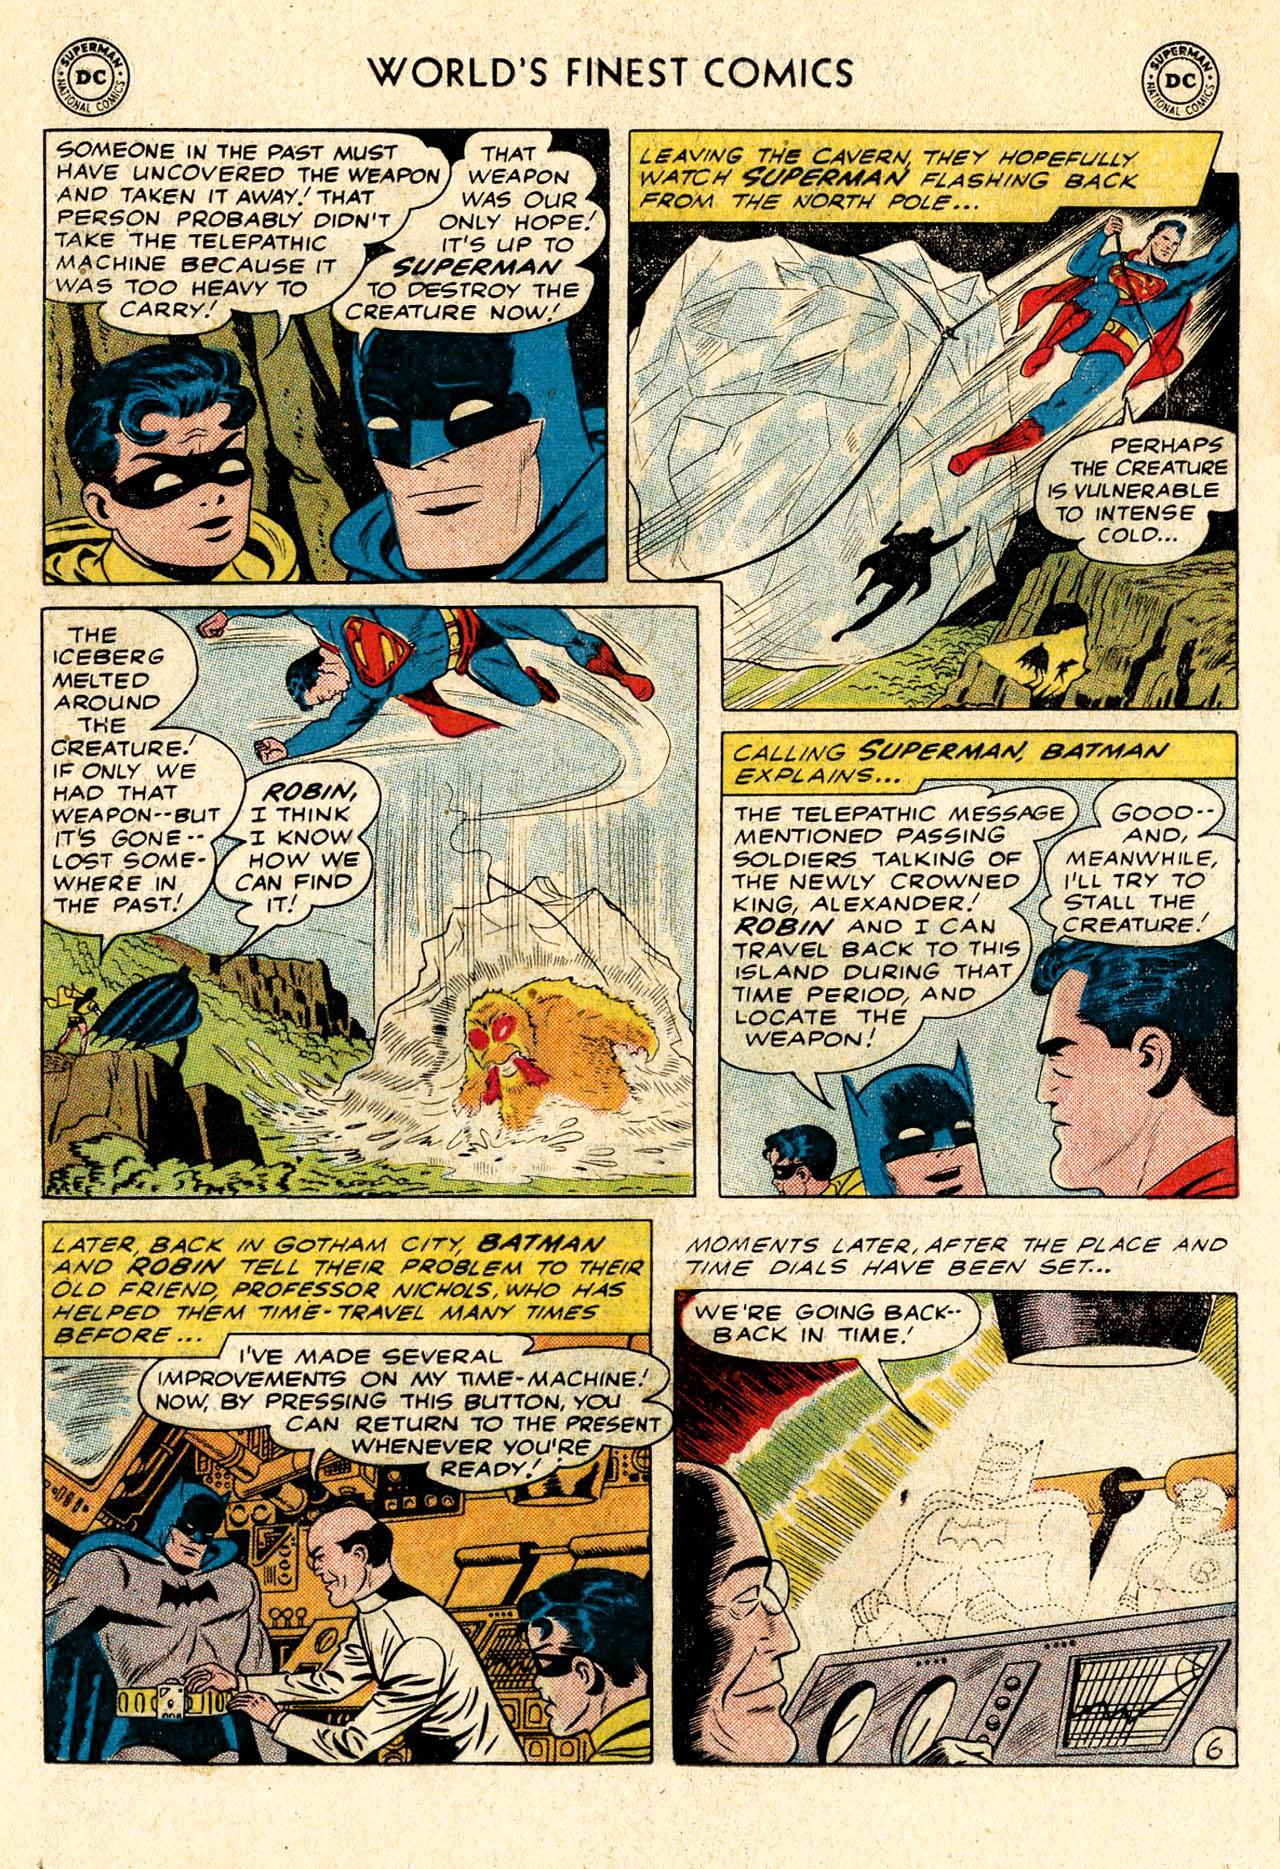 Read online World's Finest Comics comic -  Issue #107 - 8